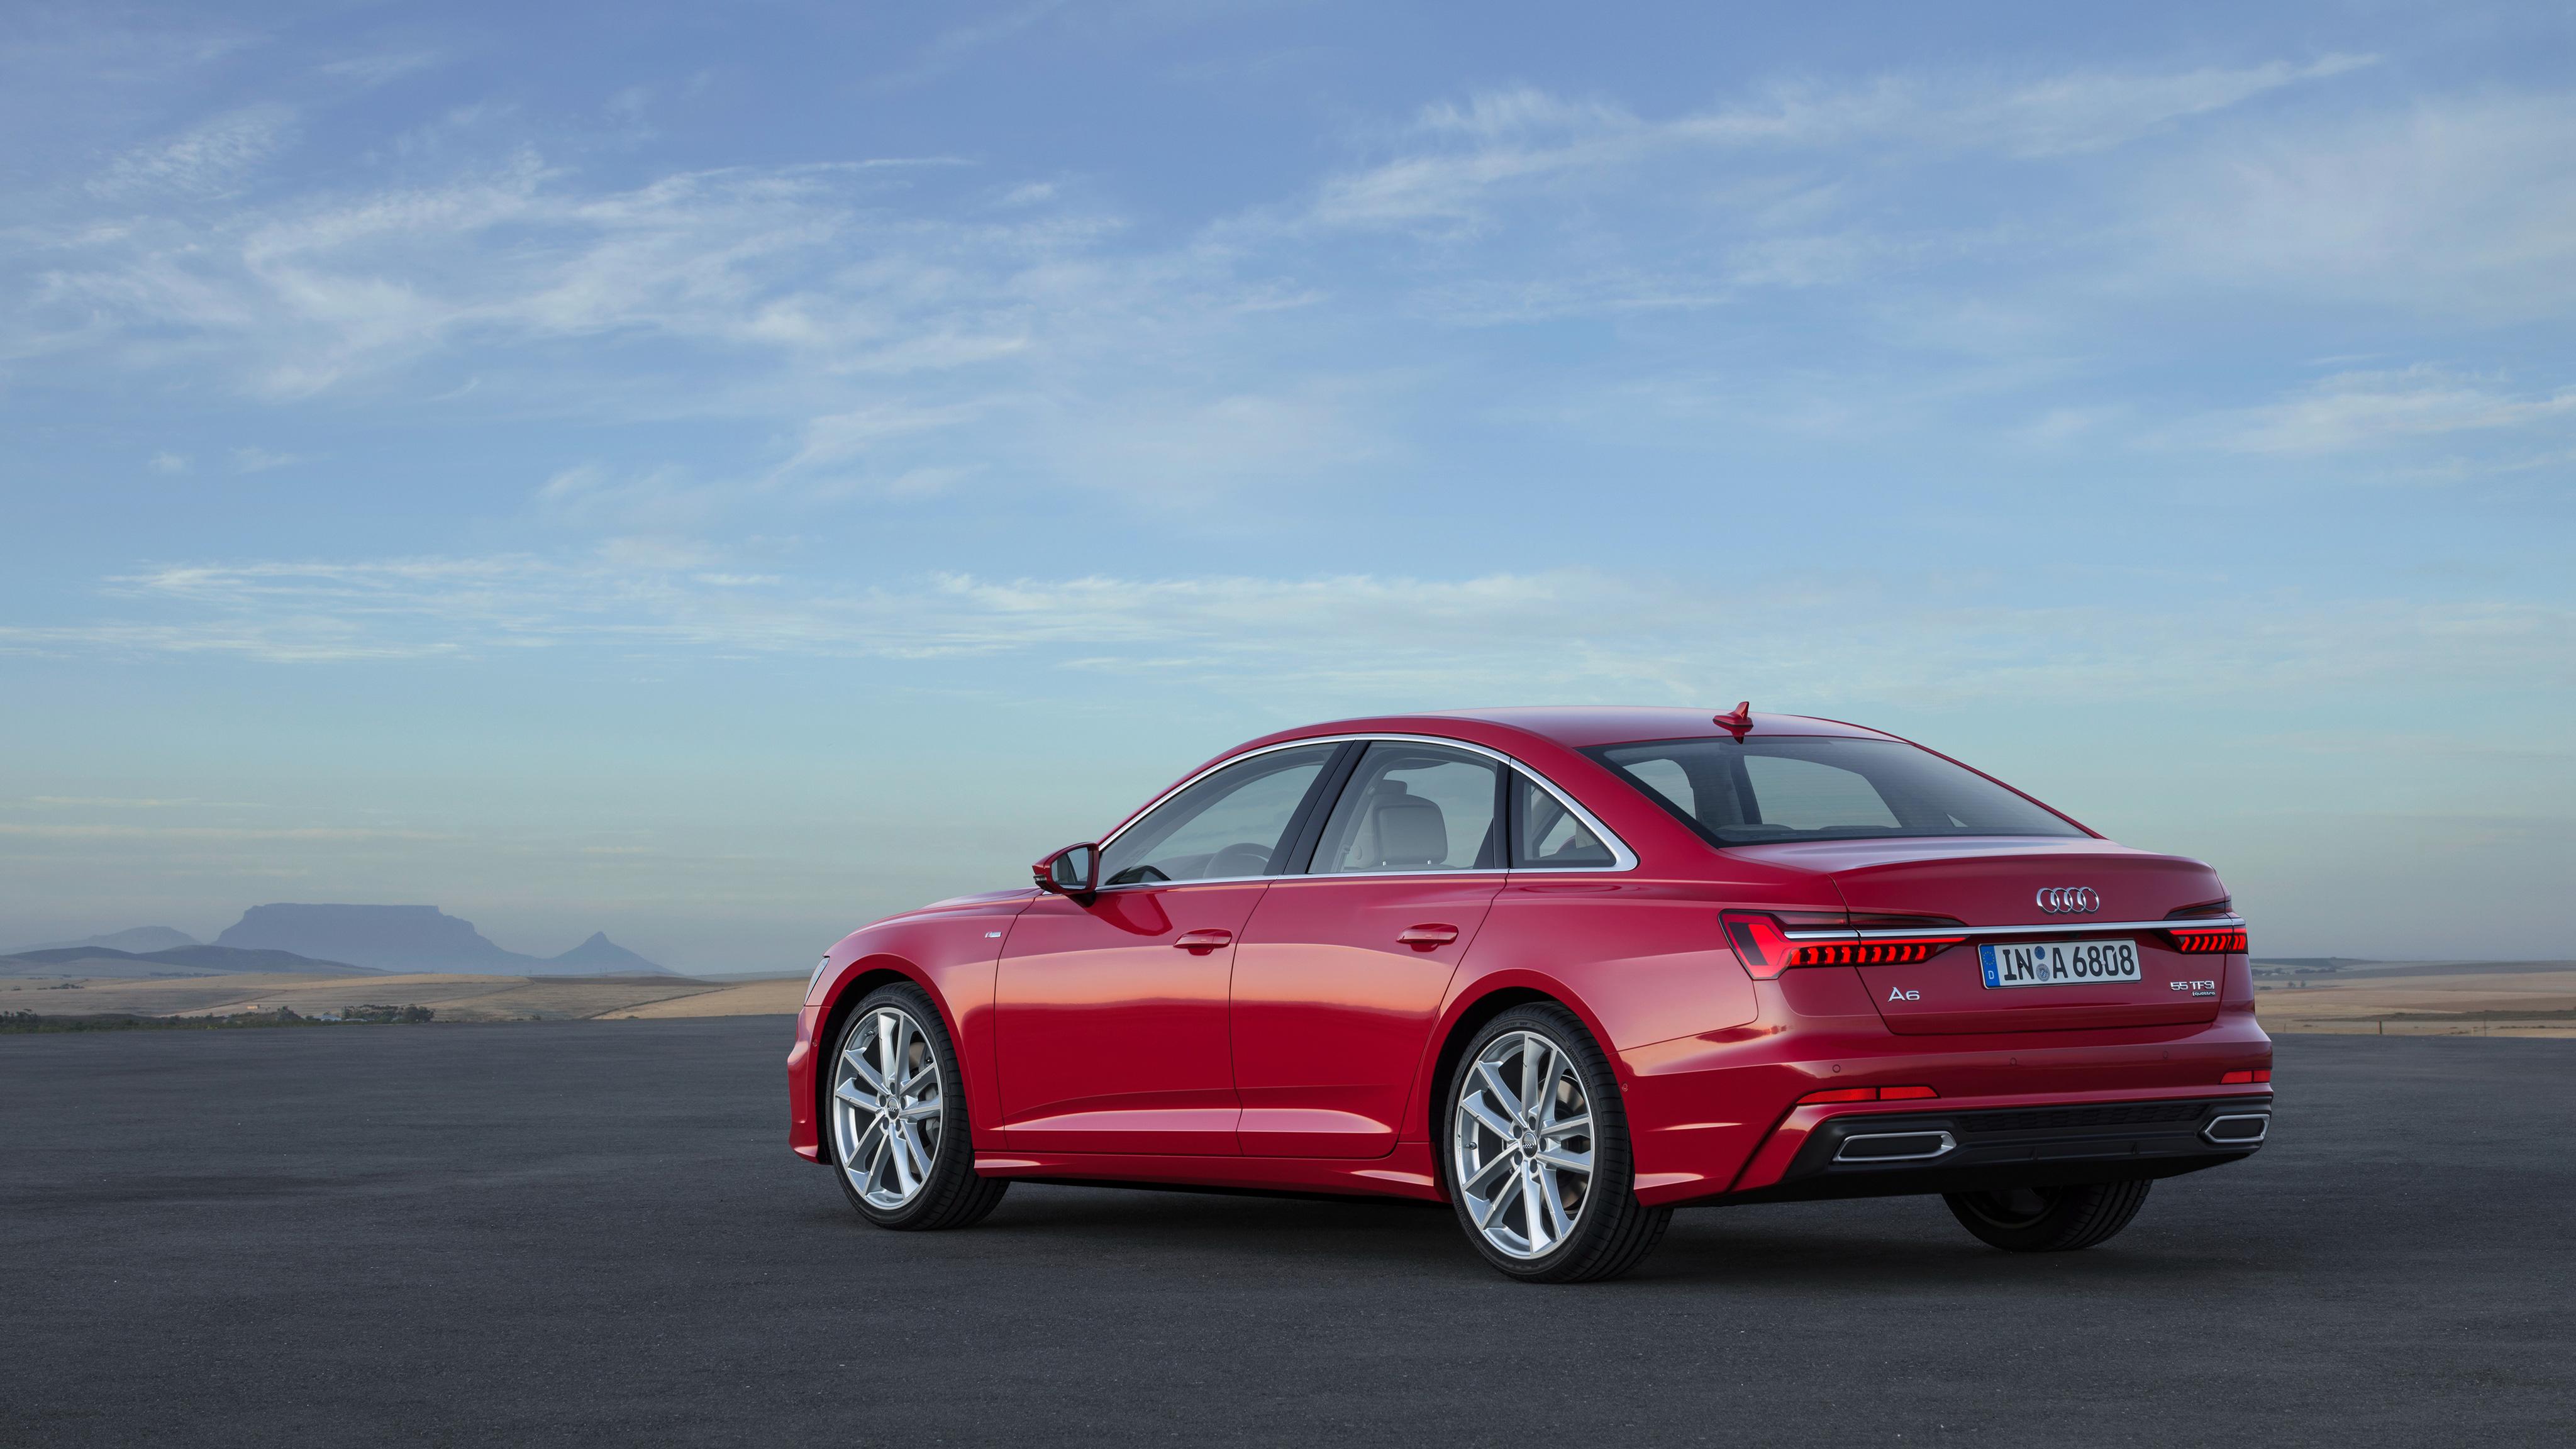 Audi A6 55 TFSI Quattro S Rear, HD Cars, 4k Wallpapers, Images ...  K Audi A on audi s4, audi a11, audi a2, audi logo, audi a9, audi aa, audi x6, audi a1, audi r6,